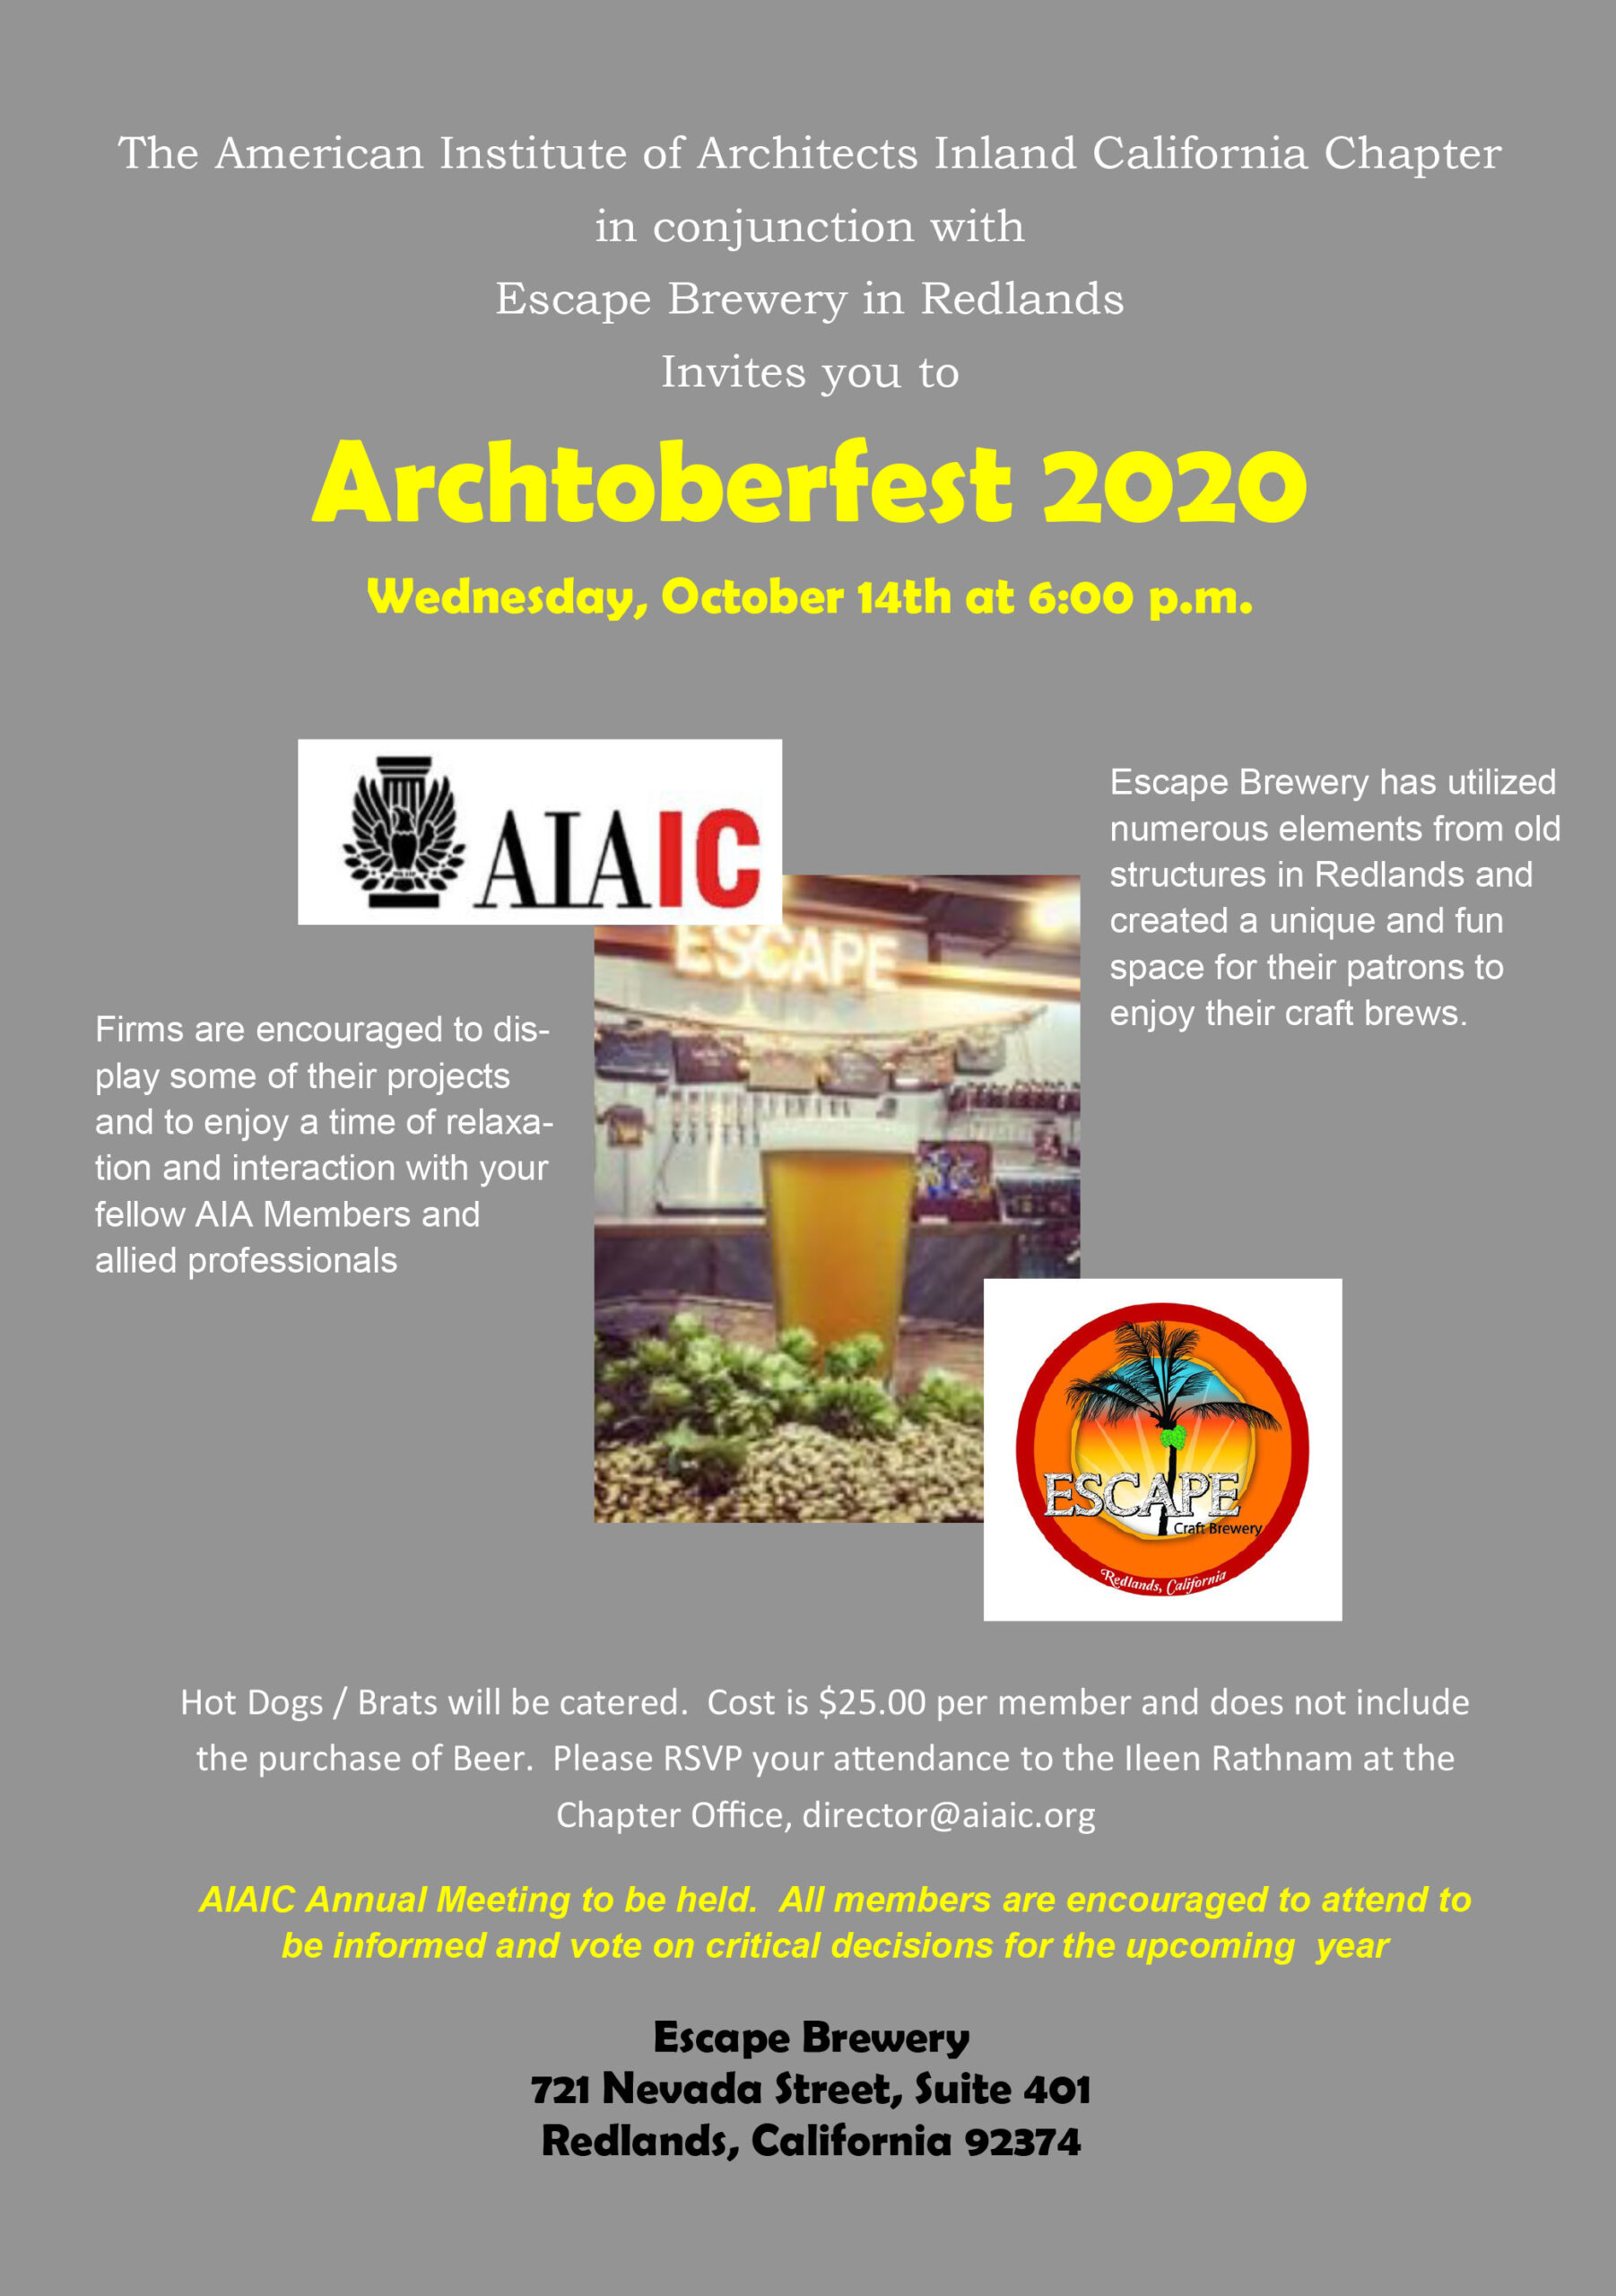 Archtoberfest